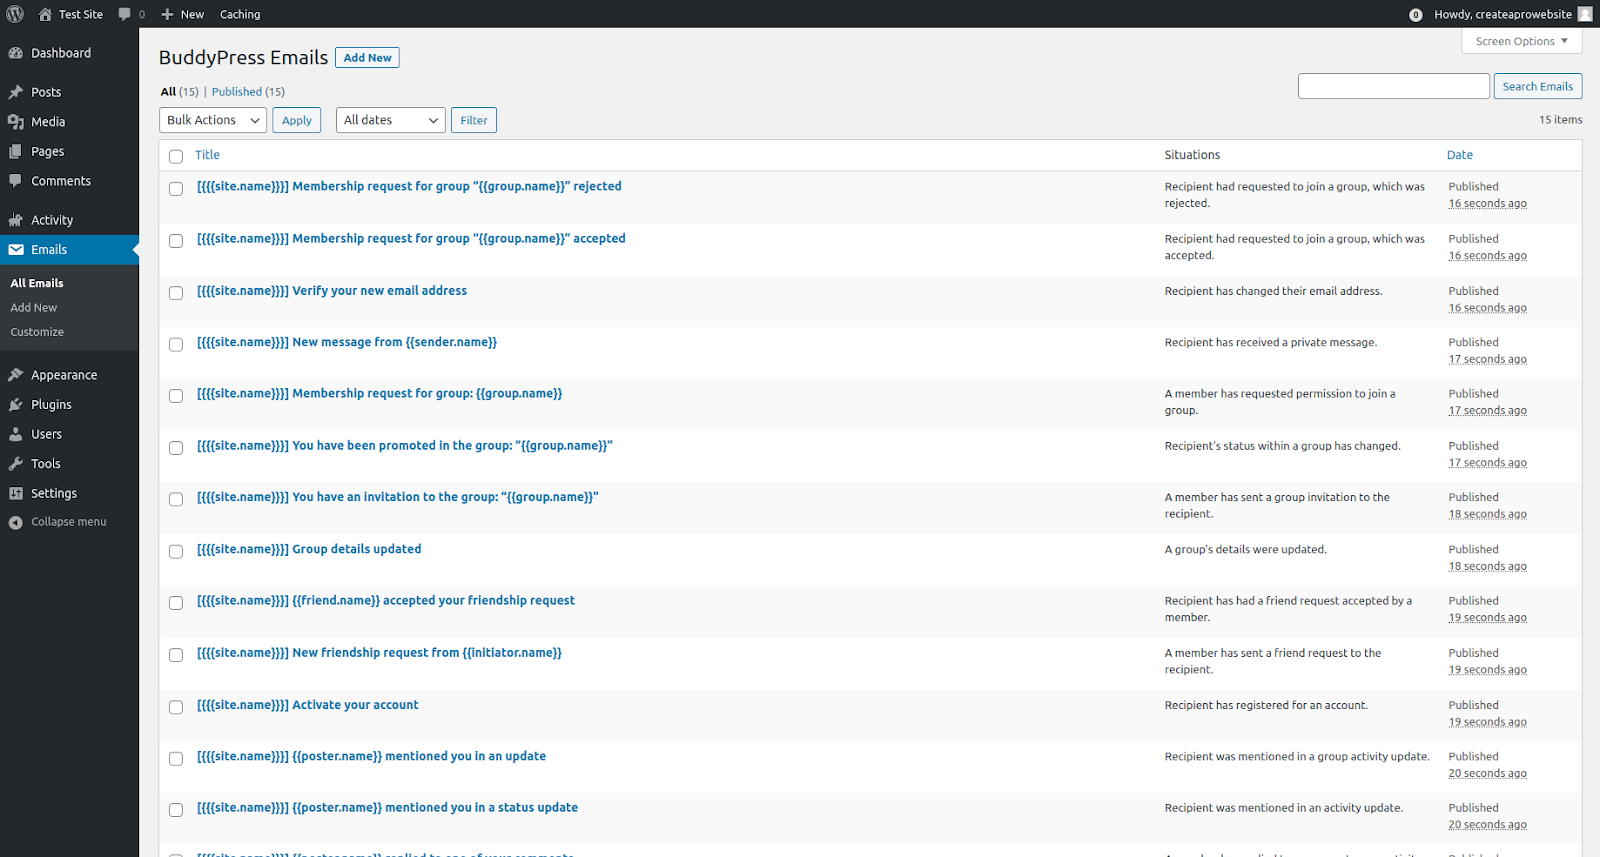 buddypress wordpress membership plugin features